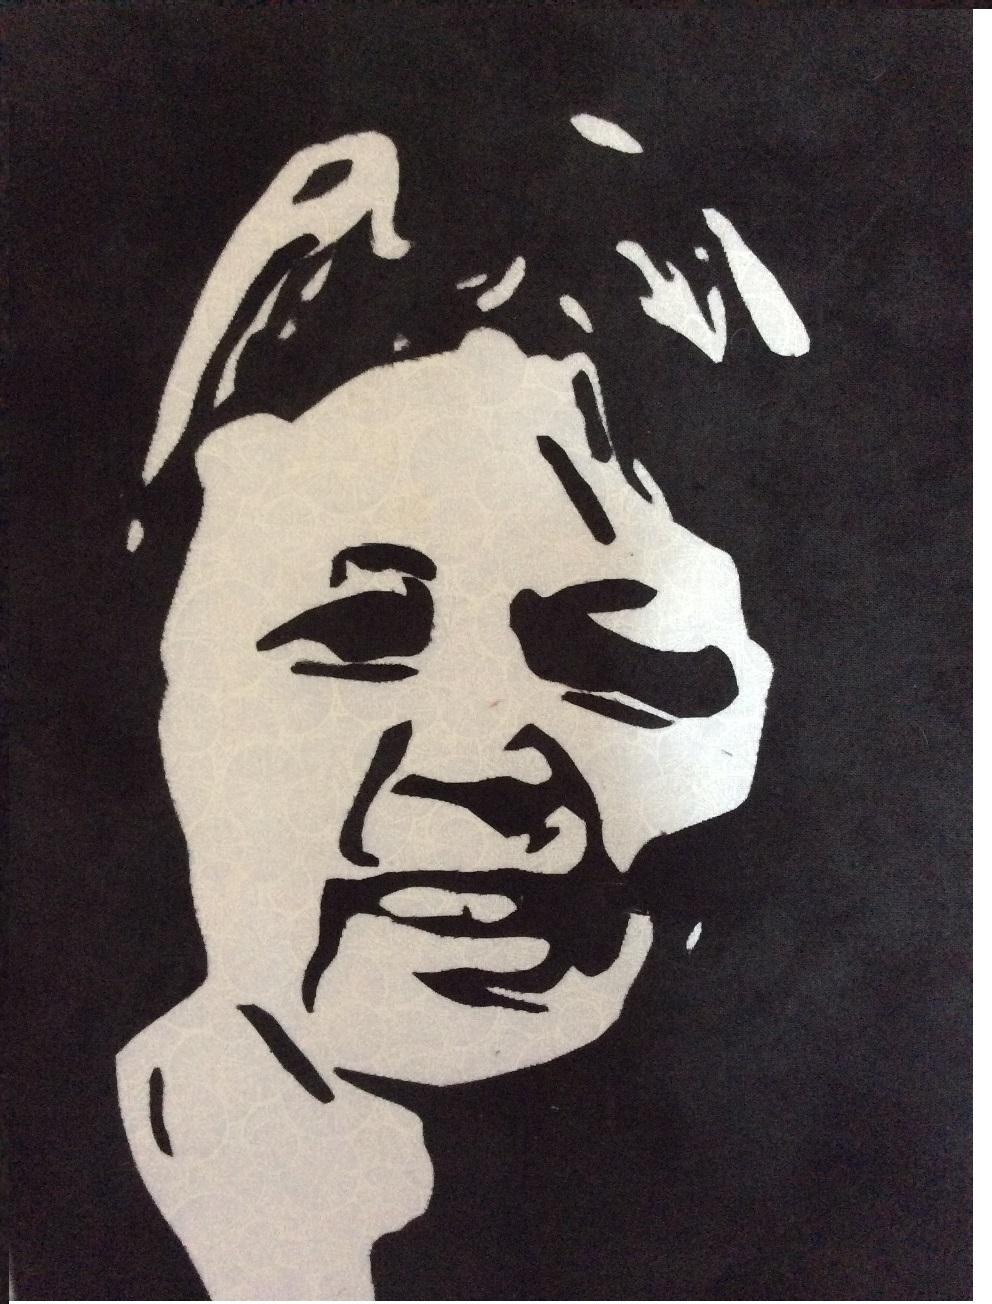 Self portrait: raw edge applique, black on white